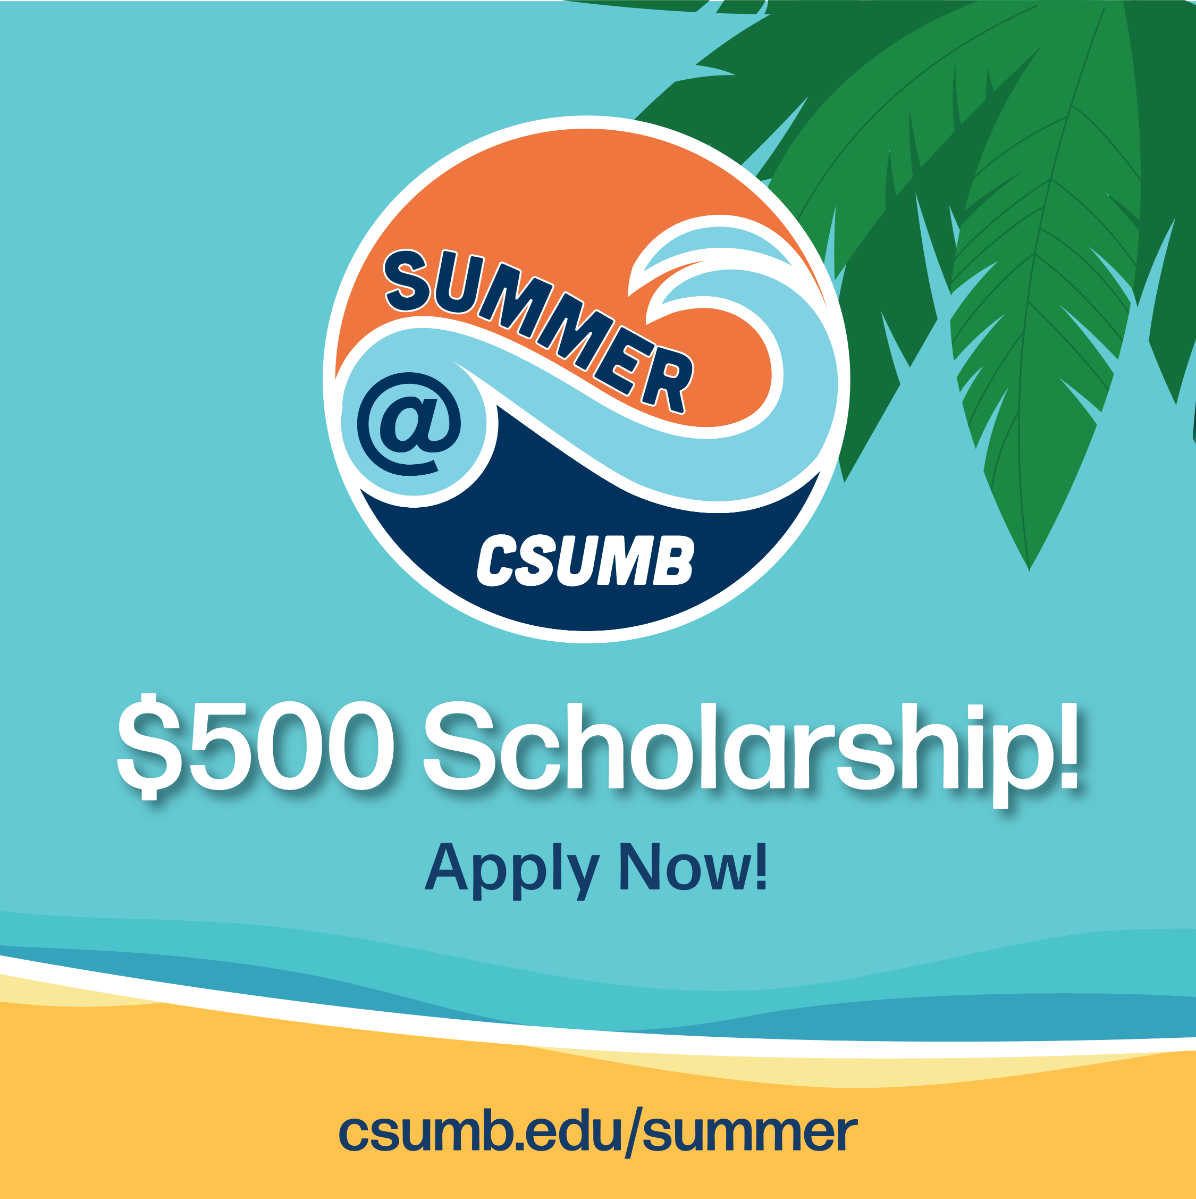 $500 Scholarship! Apply Now! csumb.edu/summer